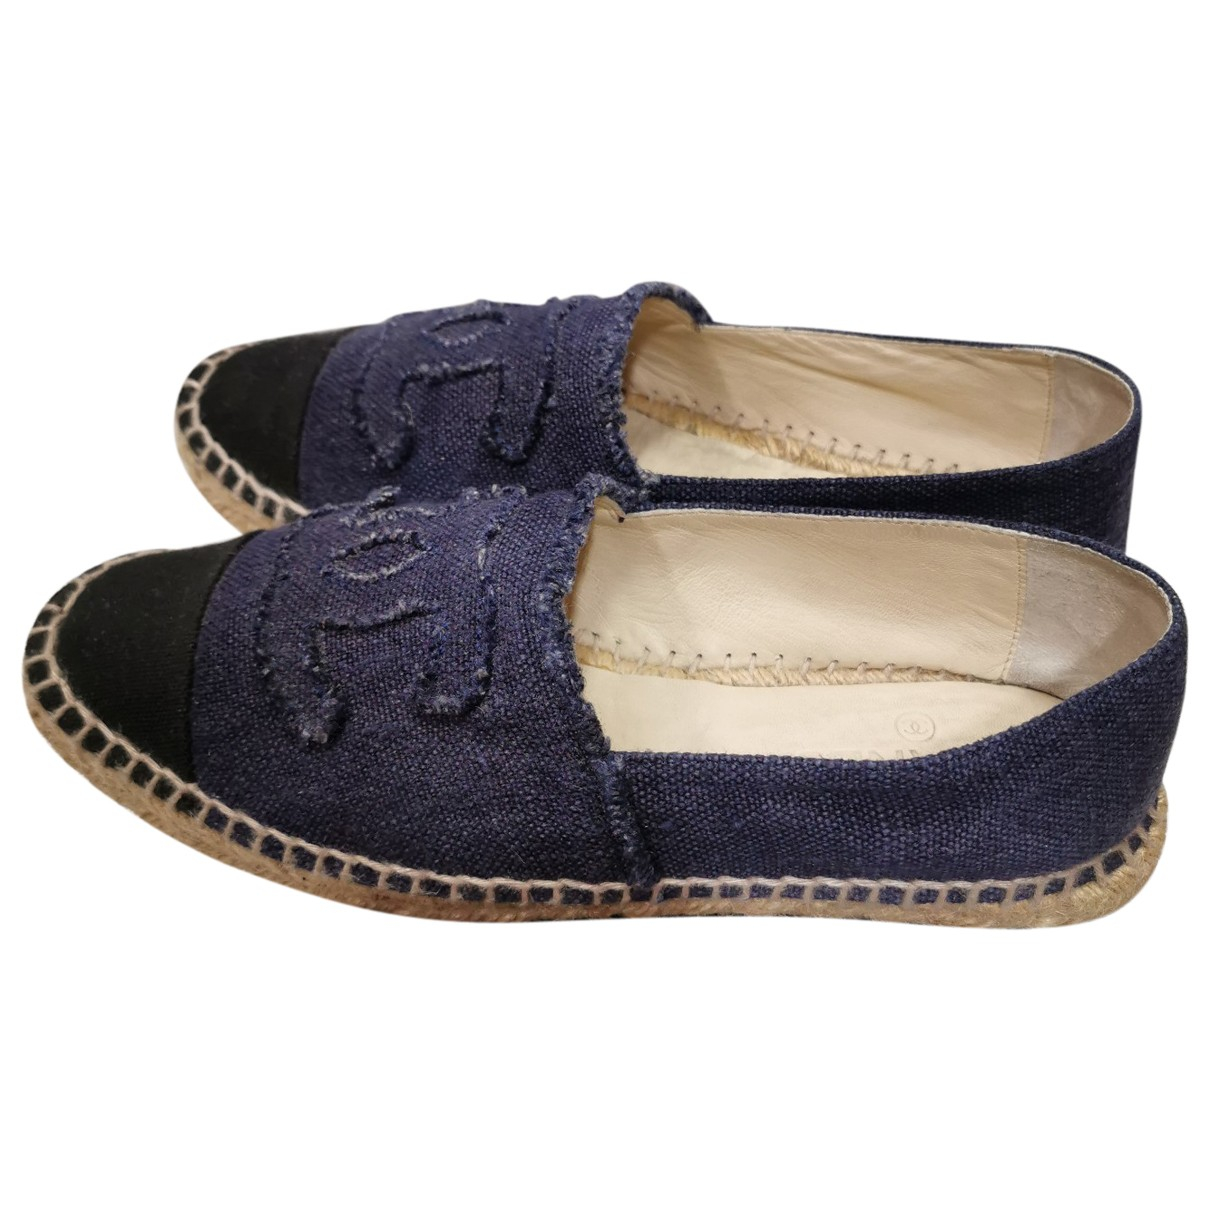 Chanel \N Espadrilles in  Blau Denim - Jeans